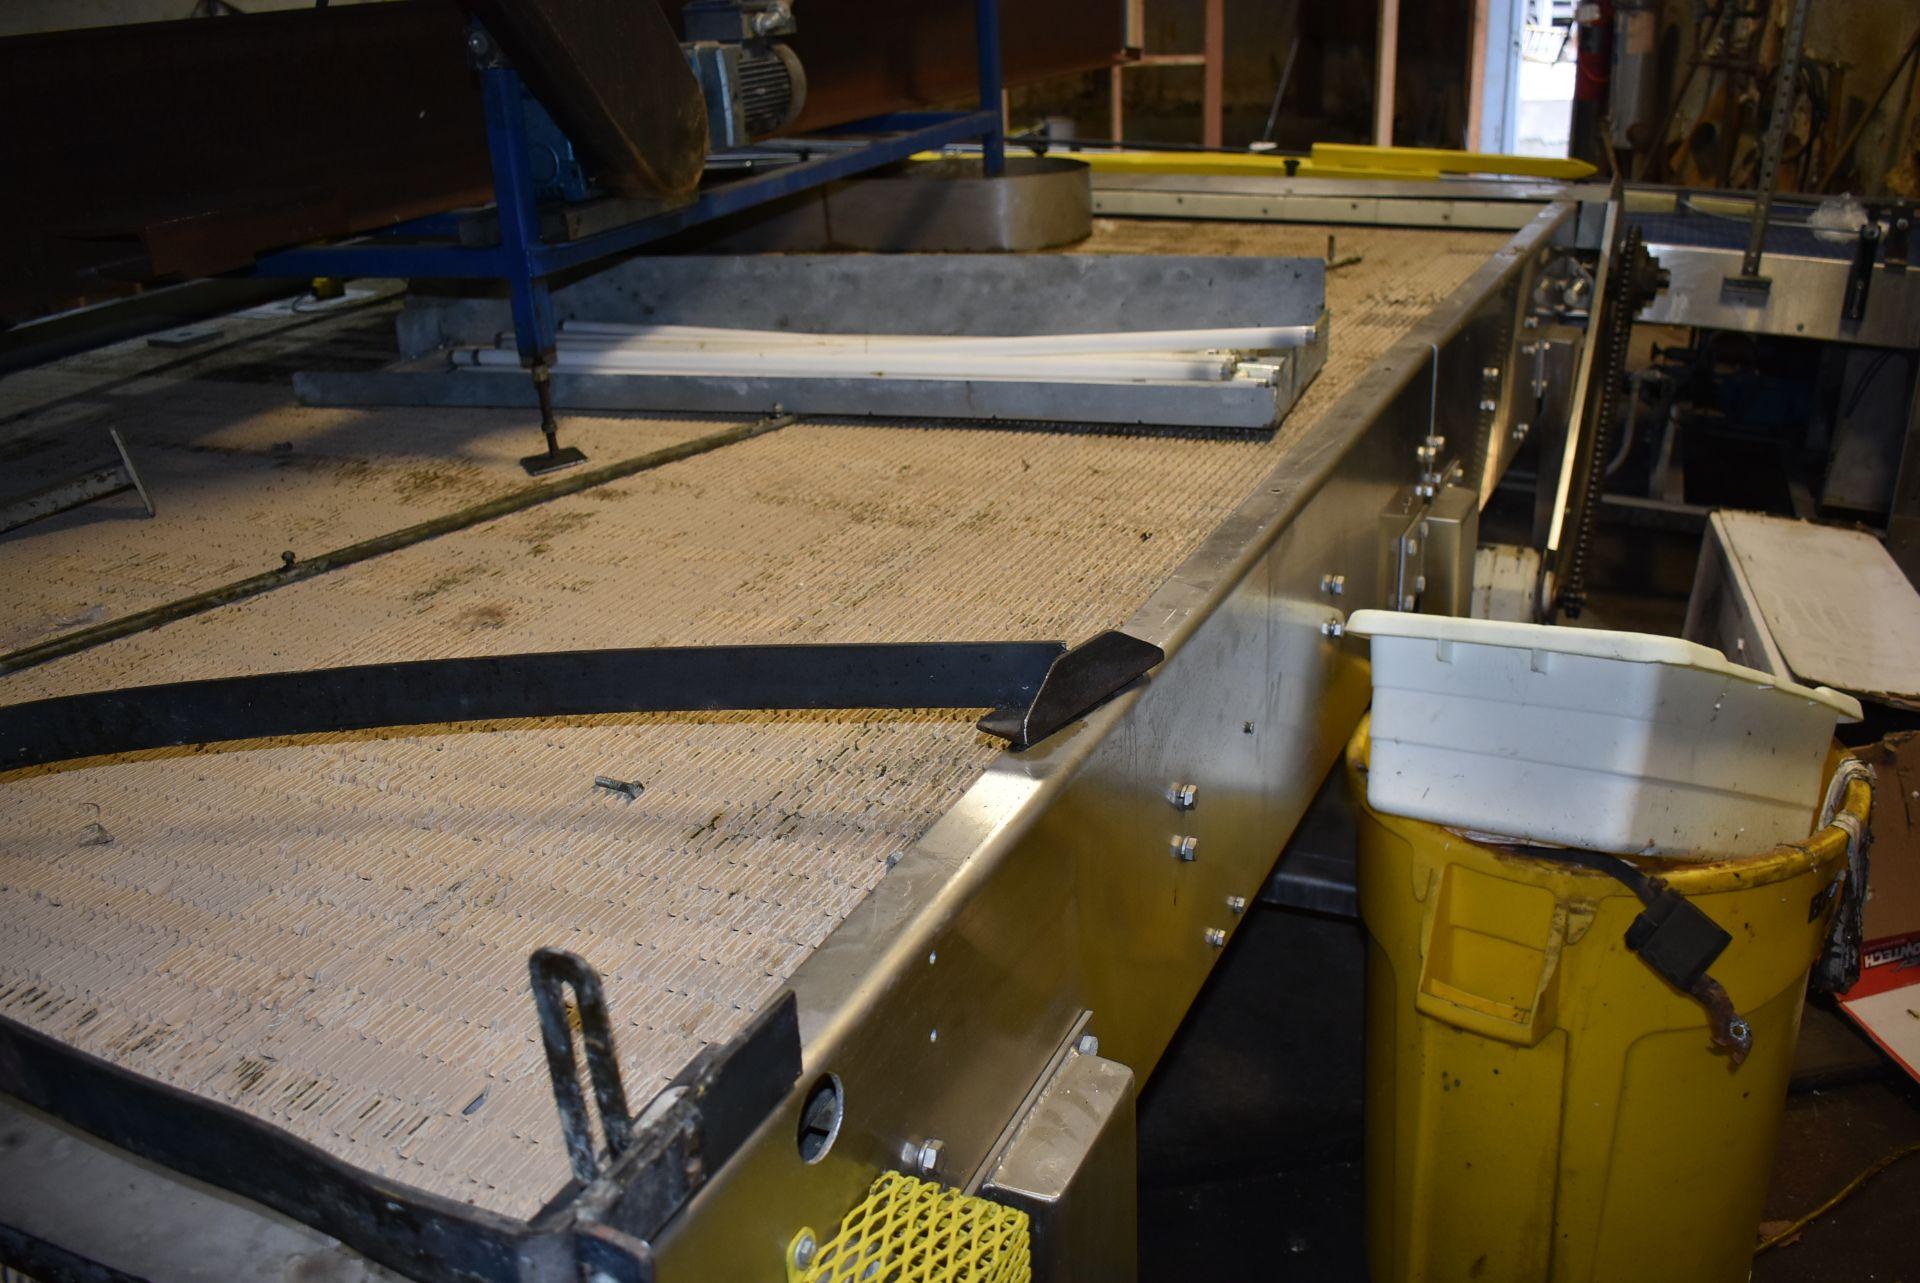 Motorized Belt Conveyor/Accumulation Table, 10' x 8' - Image 2 of 3